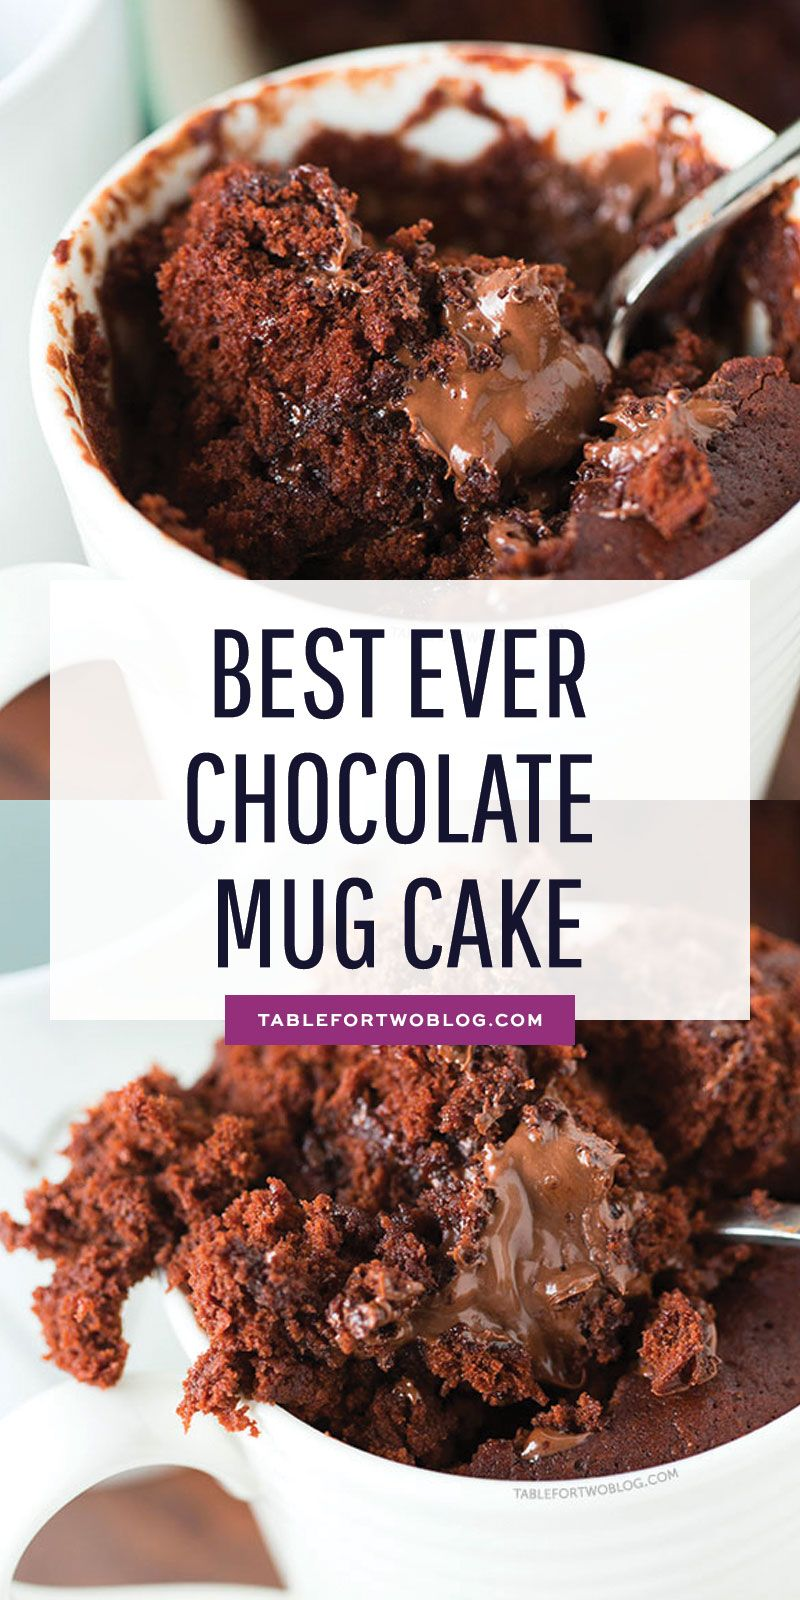 The Moistest Chocolate Mug Cake - Mug Cake For One